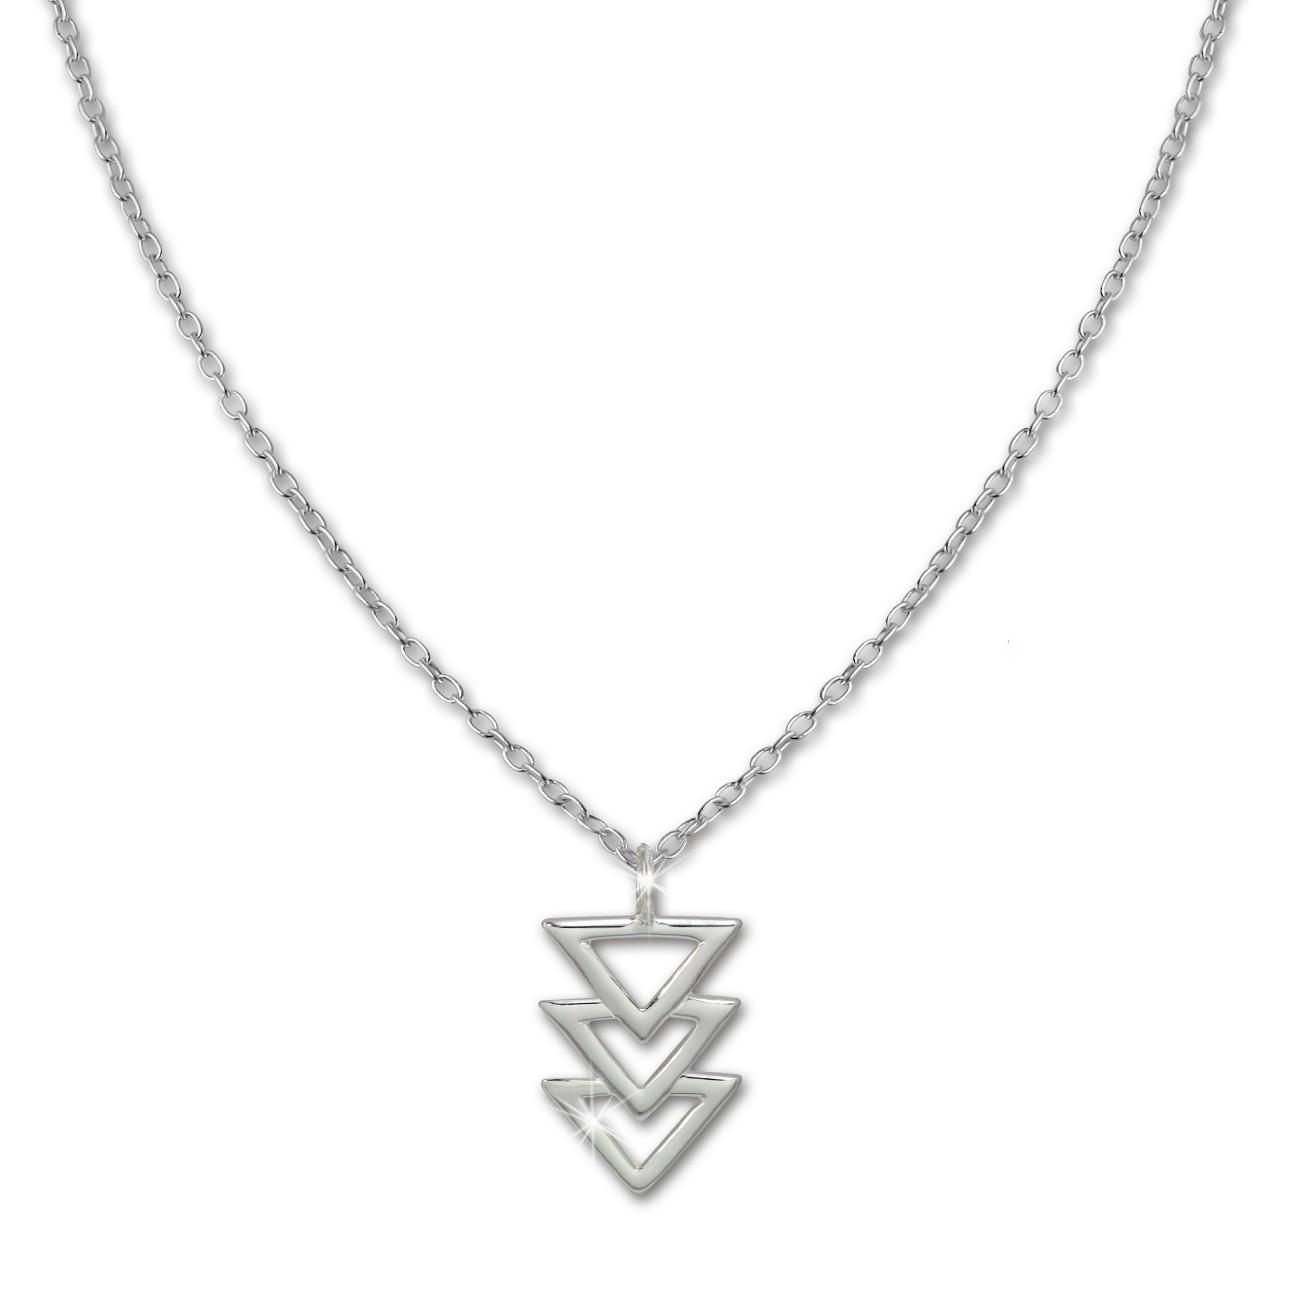 SilberDream Kette Dreiecke 925er Sterling Silber 45cm Damen Halskette SDK8013J